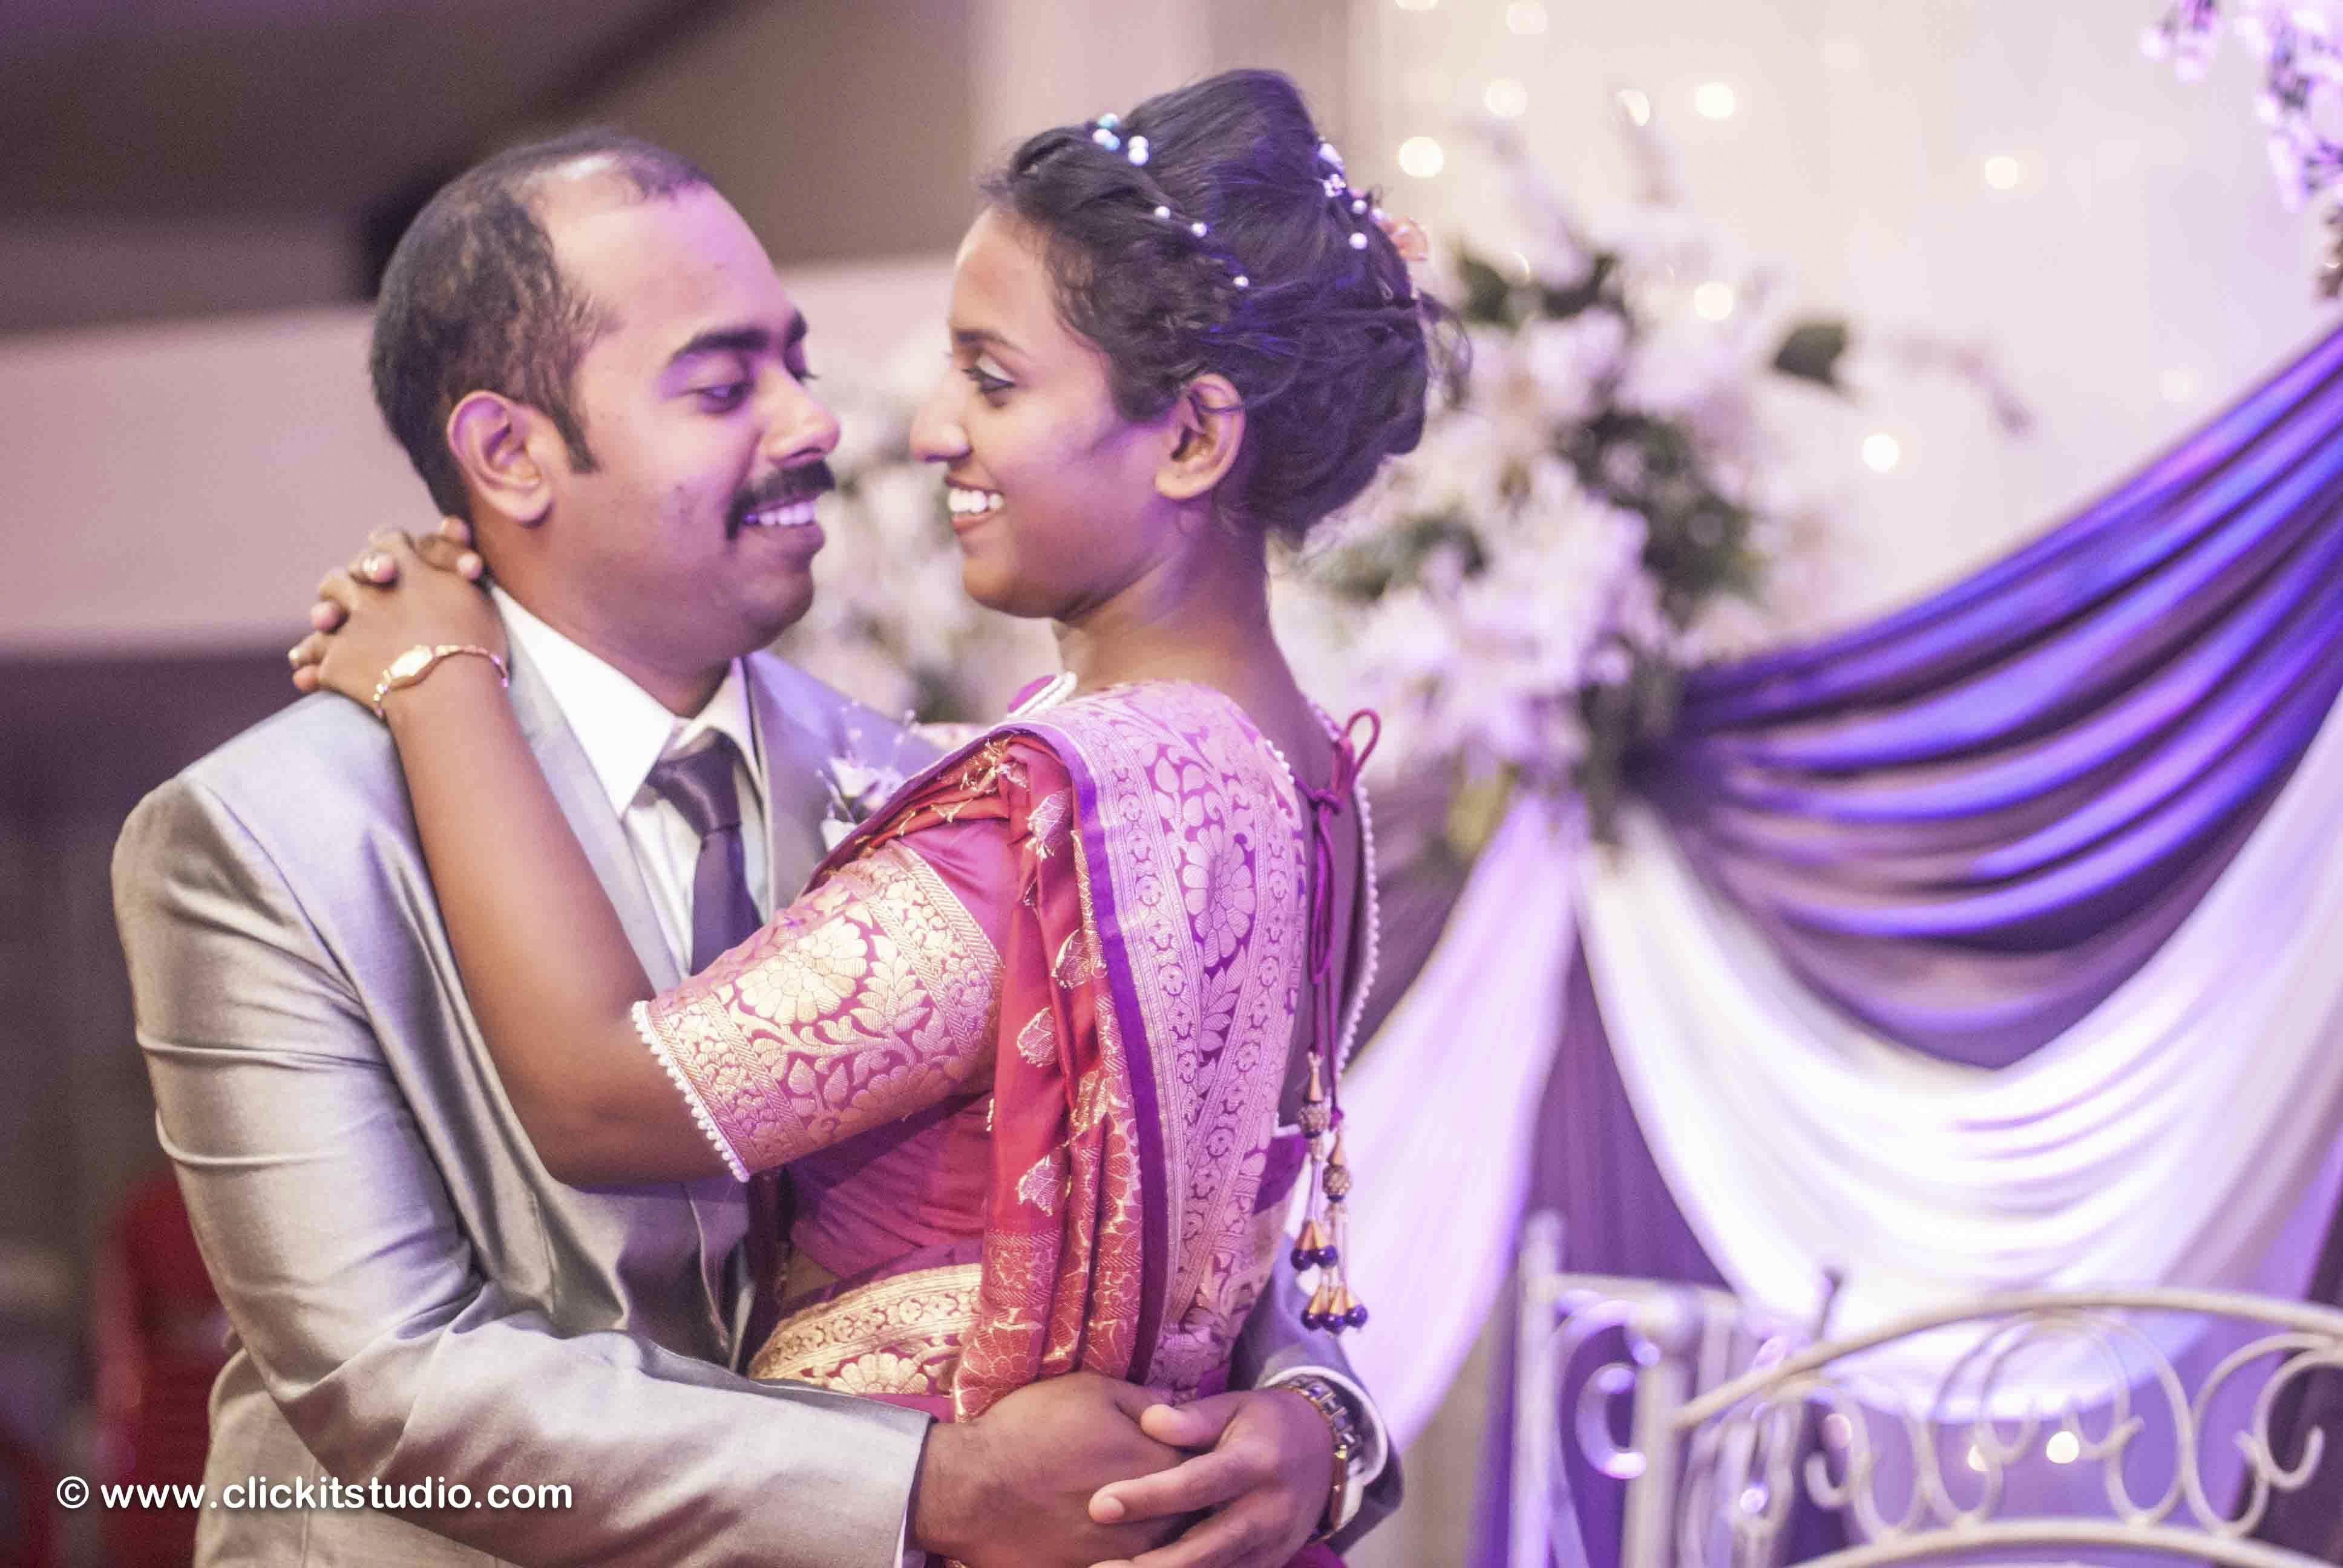 Pentecostal Wedding, Mumbai Wedding Photography, Candid Photography ...